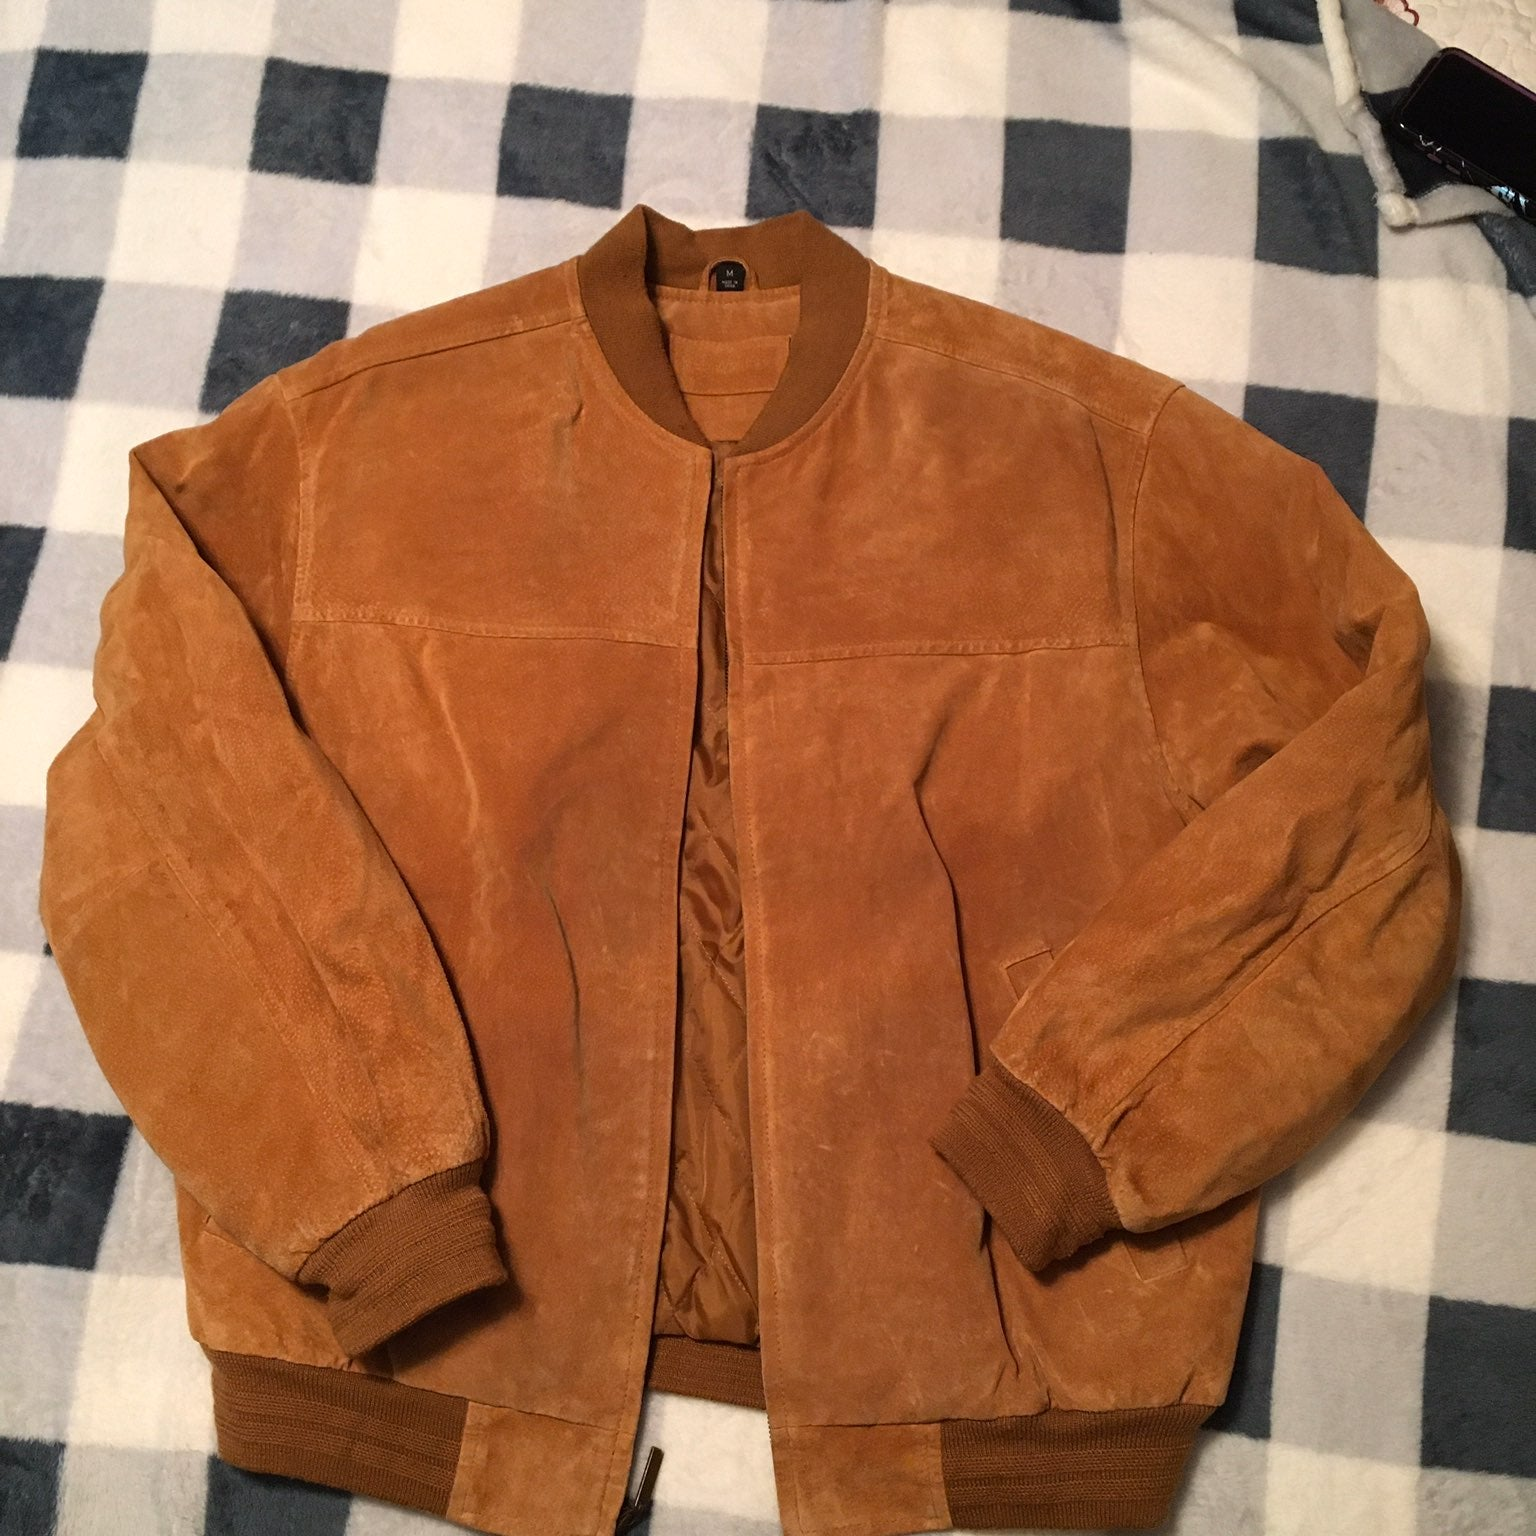 John ashford Leather Bomber Jacket sizeM